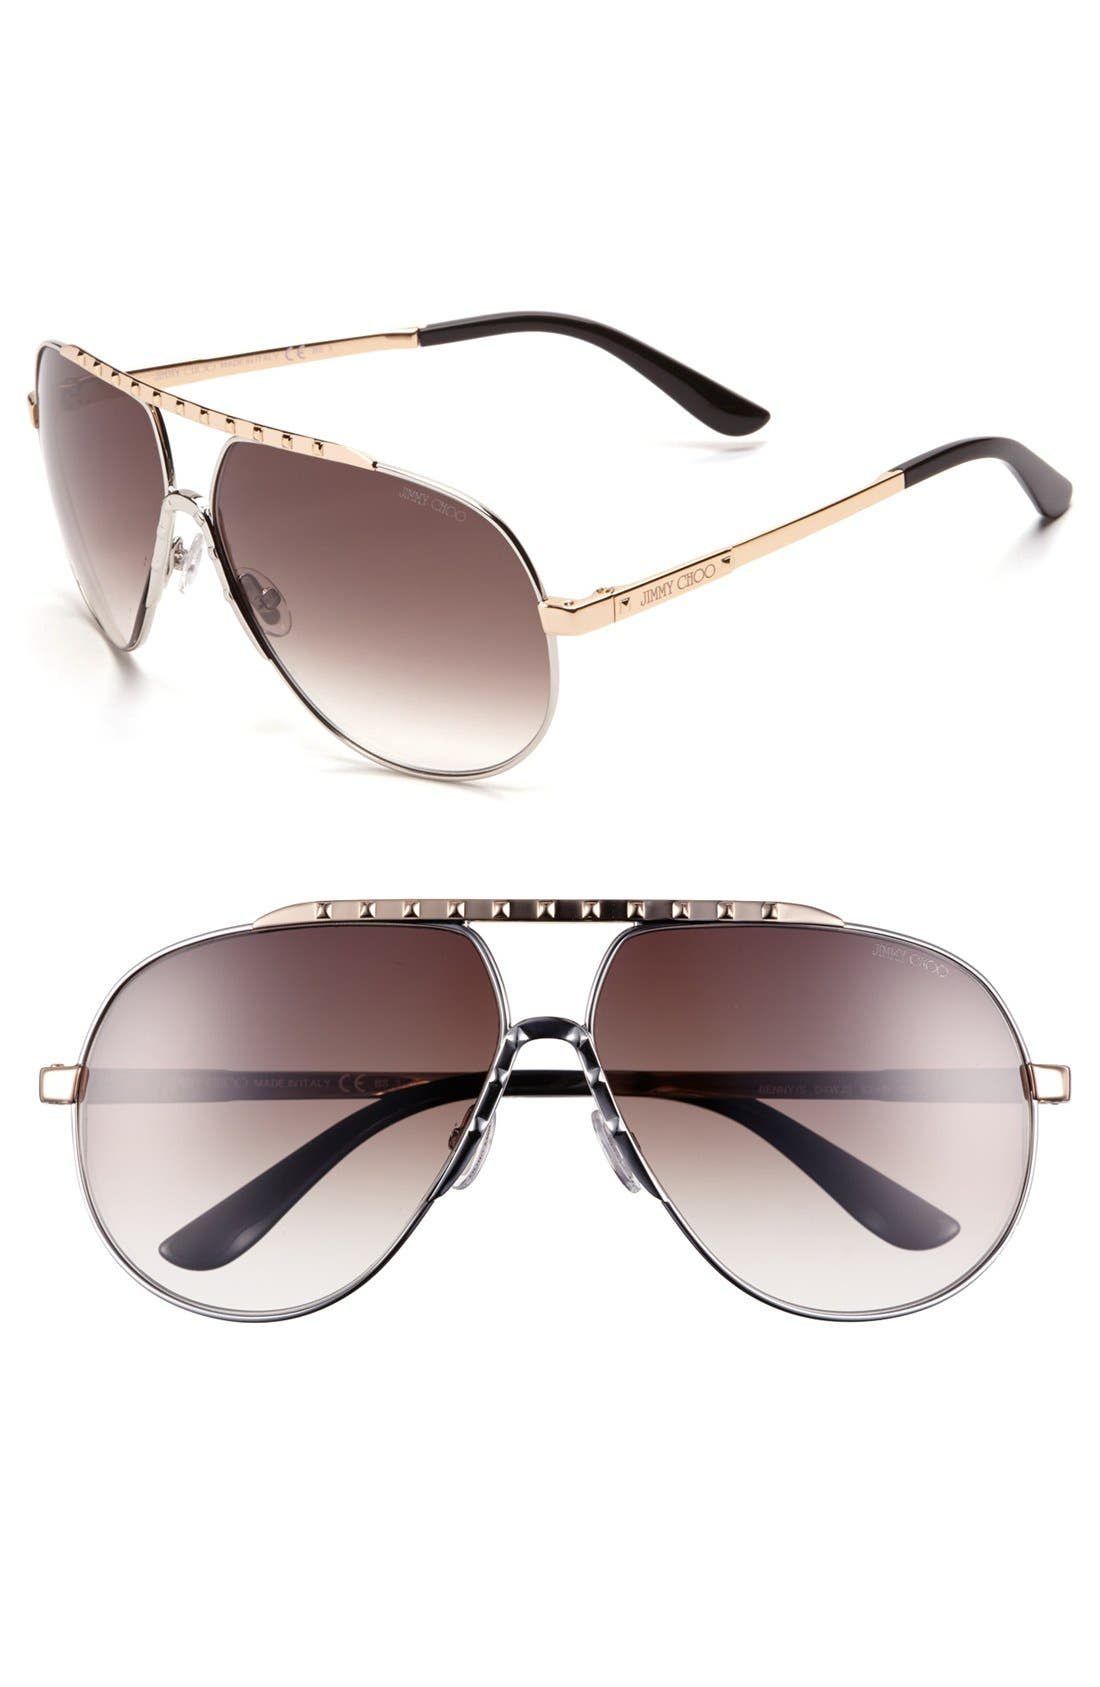 Main Image - Jimmy Choo 62mm Stainless Steel Aviator Sunglasses